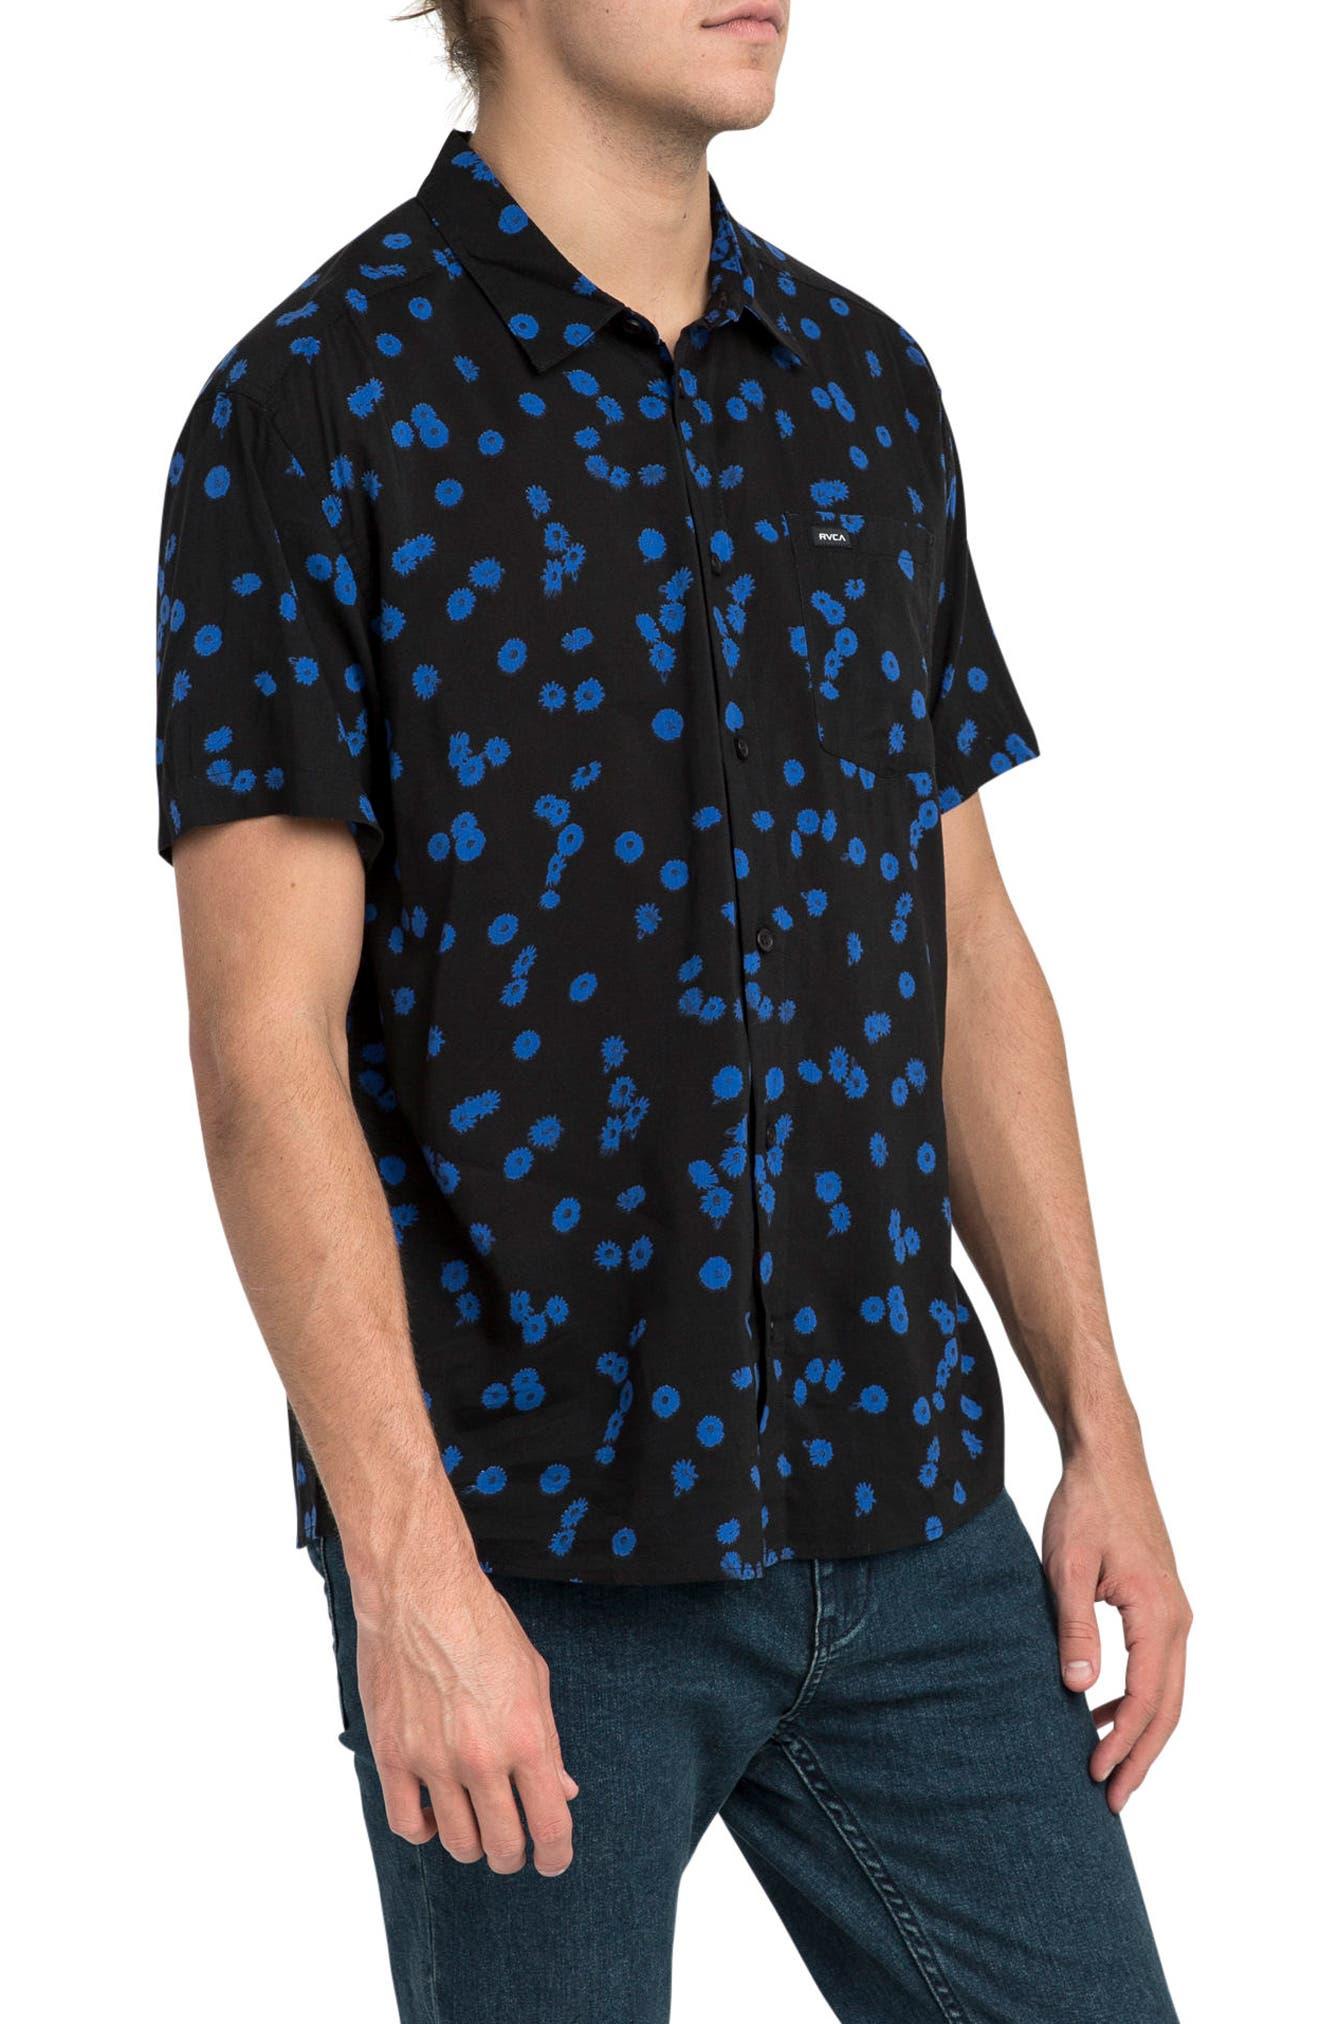 Overdye Floral Shirt,                             Alternate thumbnail 3, color,                             001